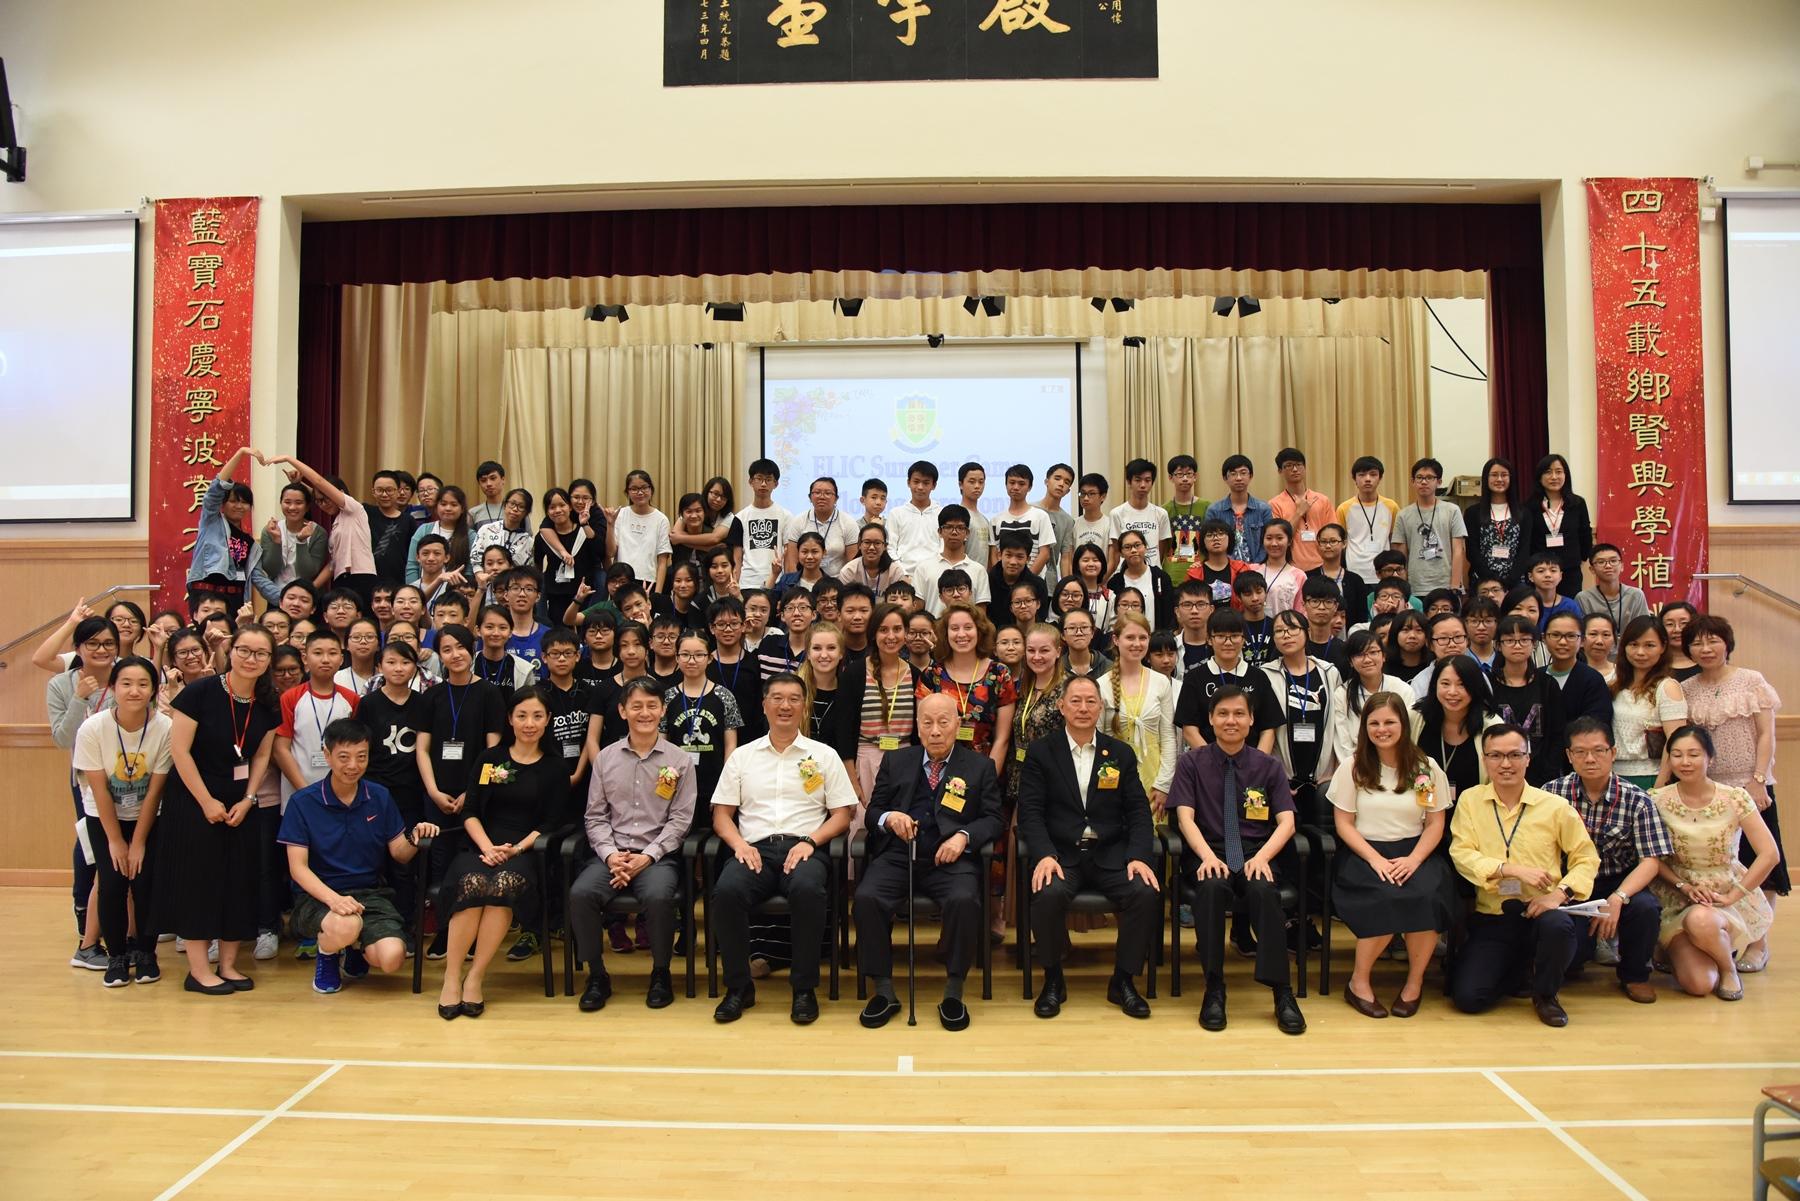 http://www.npc.edu.hk/sites/default/files/dsc_0350.jpg